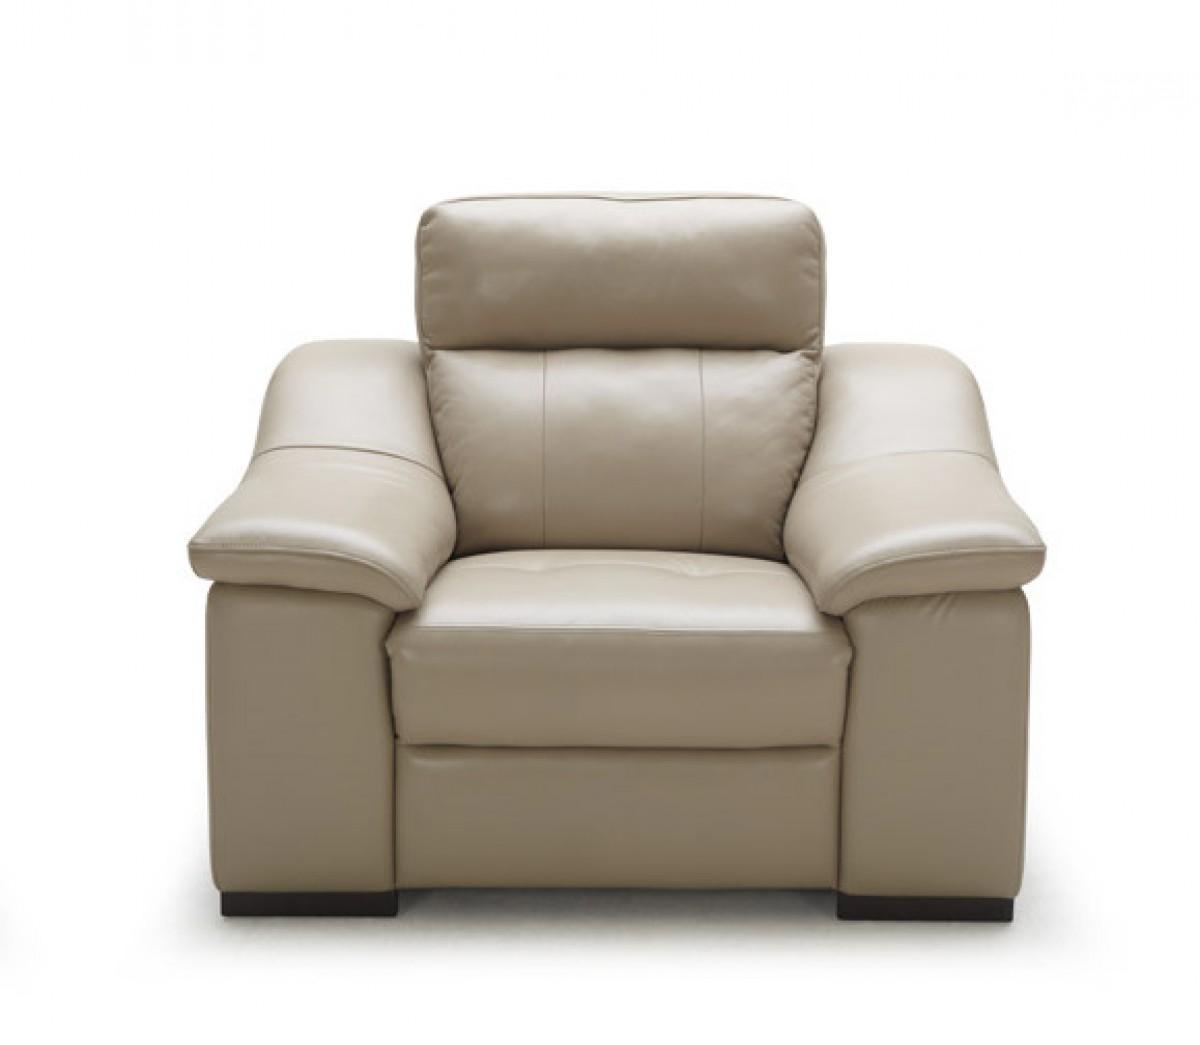 Divani Casa Saffron – Modern Beige Leather Sofa Set – Sofas Inside Beige Leather Couches (View 13 of 20)